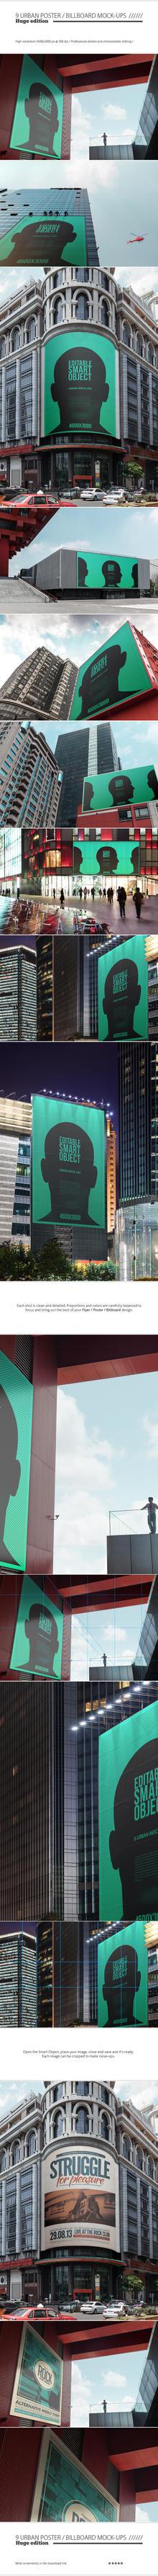 9 Urban Poster / Billboard Mock-Ups - Huge Edition by NuwanP